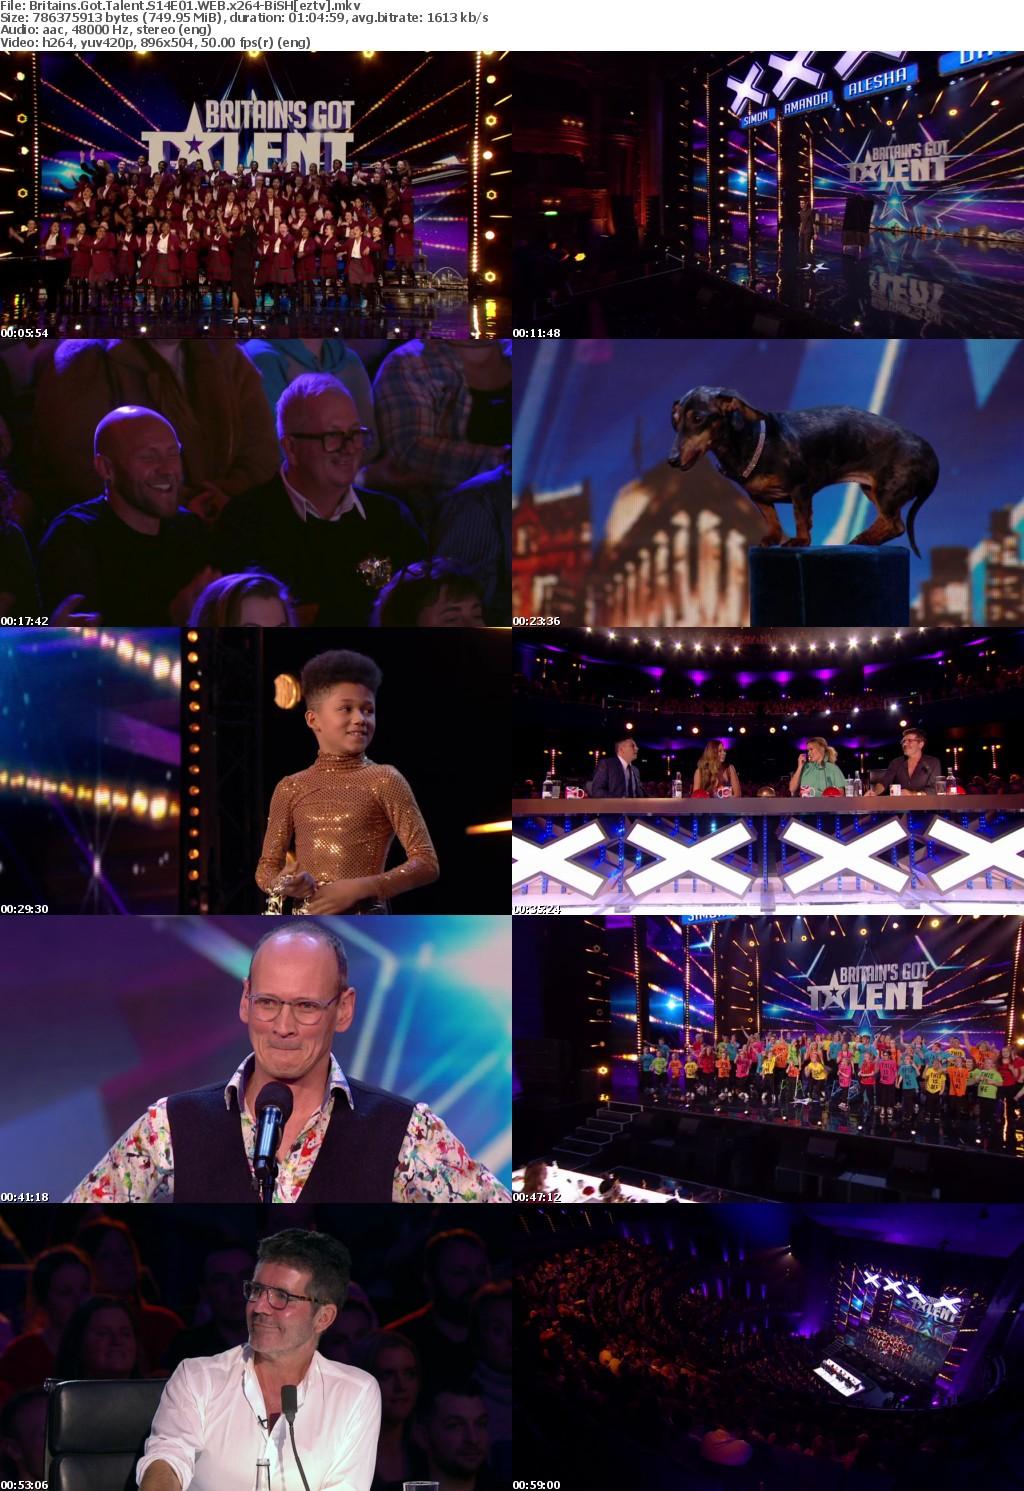 Britains Got Talent S14E01 WEB x264-BiSH